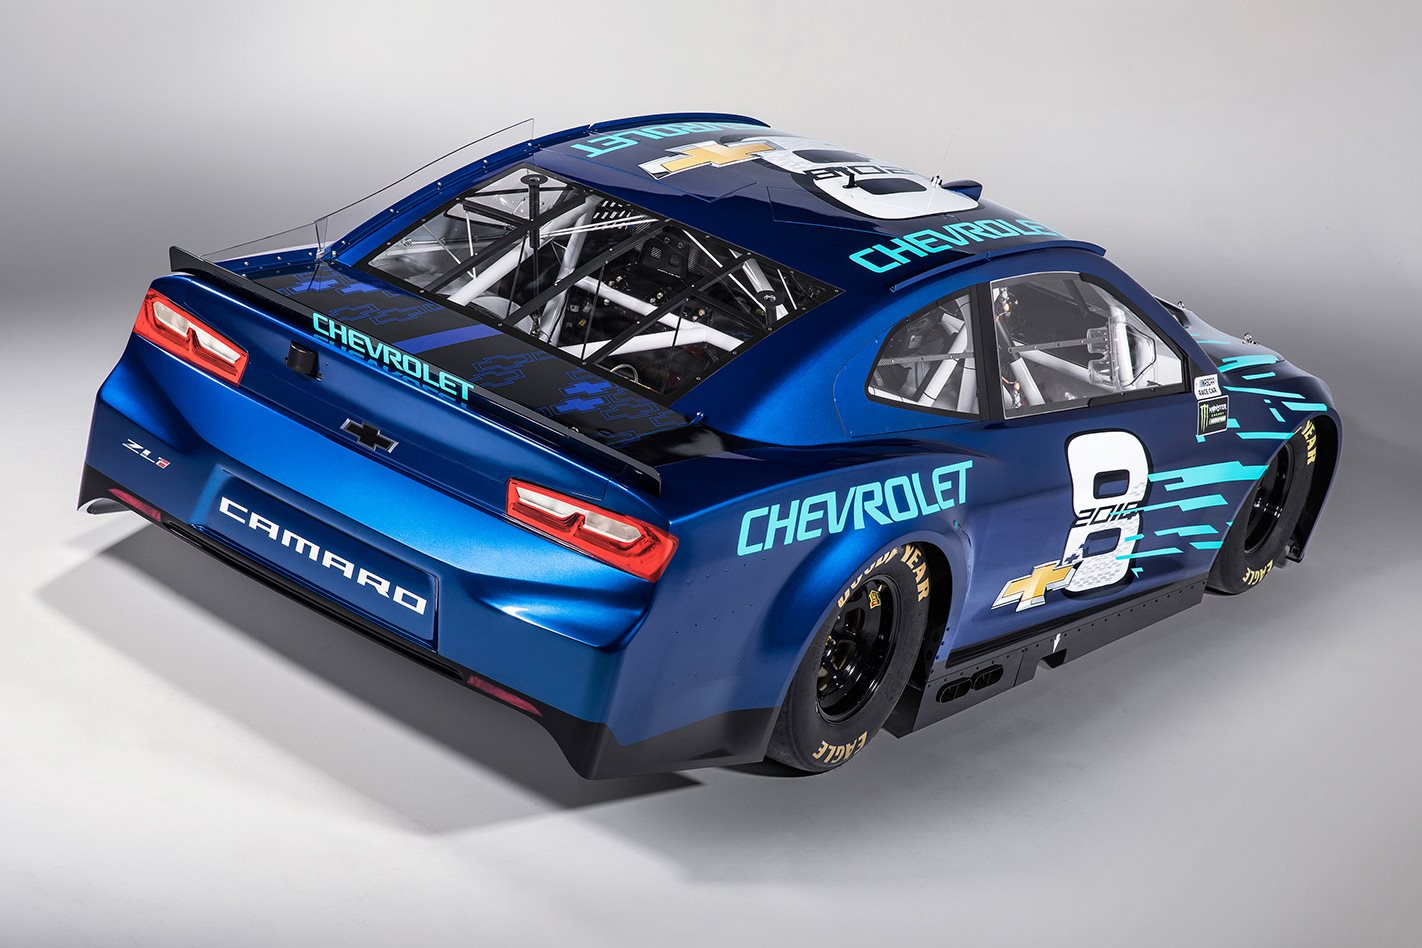 2018 Chevrolet Camaro ZL1 NASCAR cup series rear